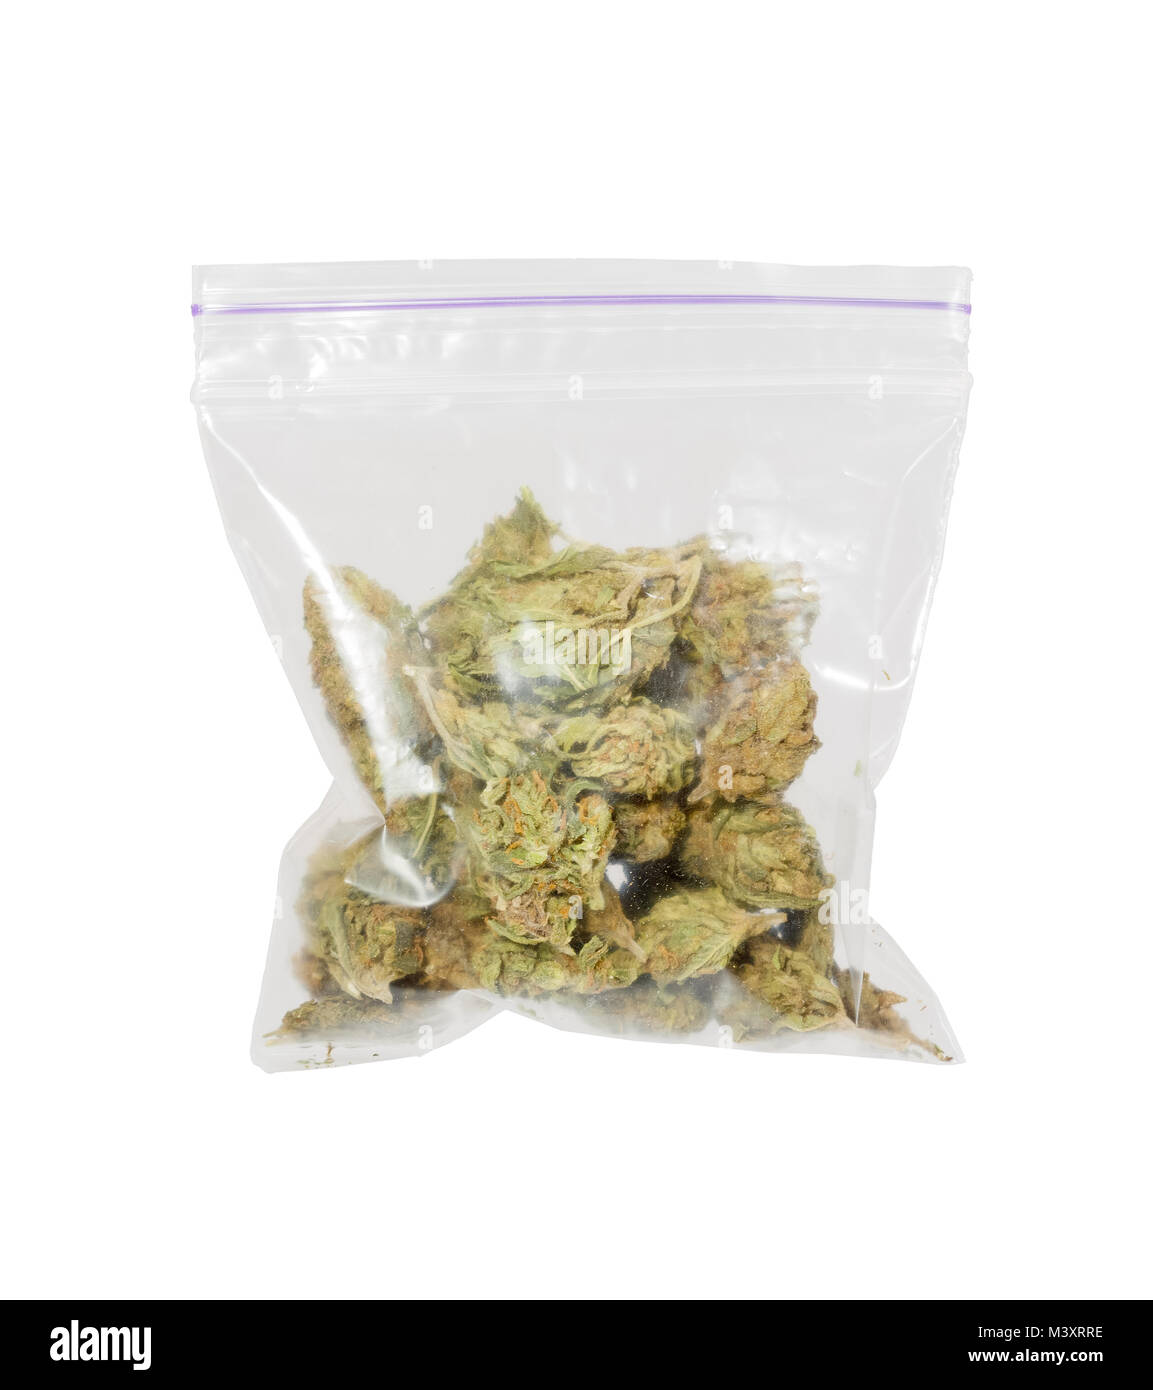 Big plastic bag of medicinal cannabis marijuana. - Stock Image